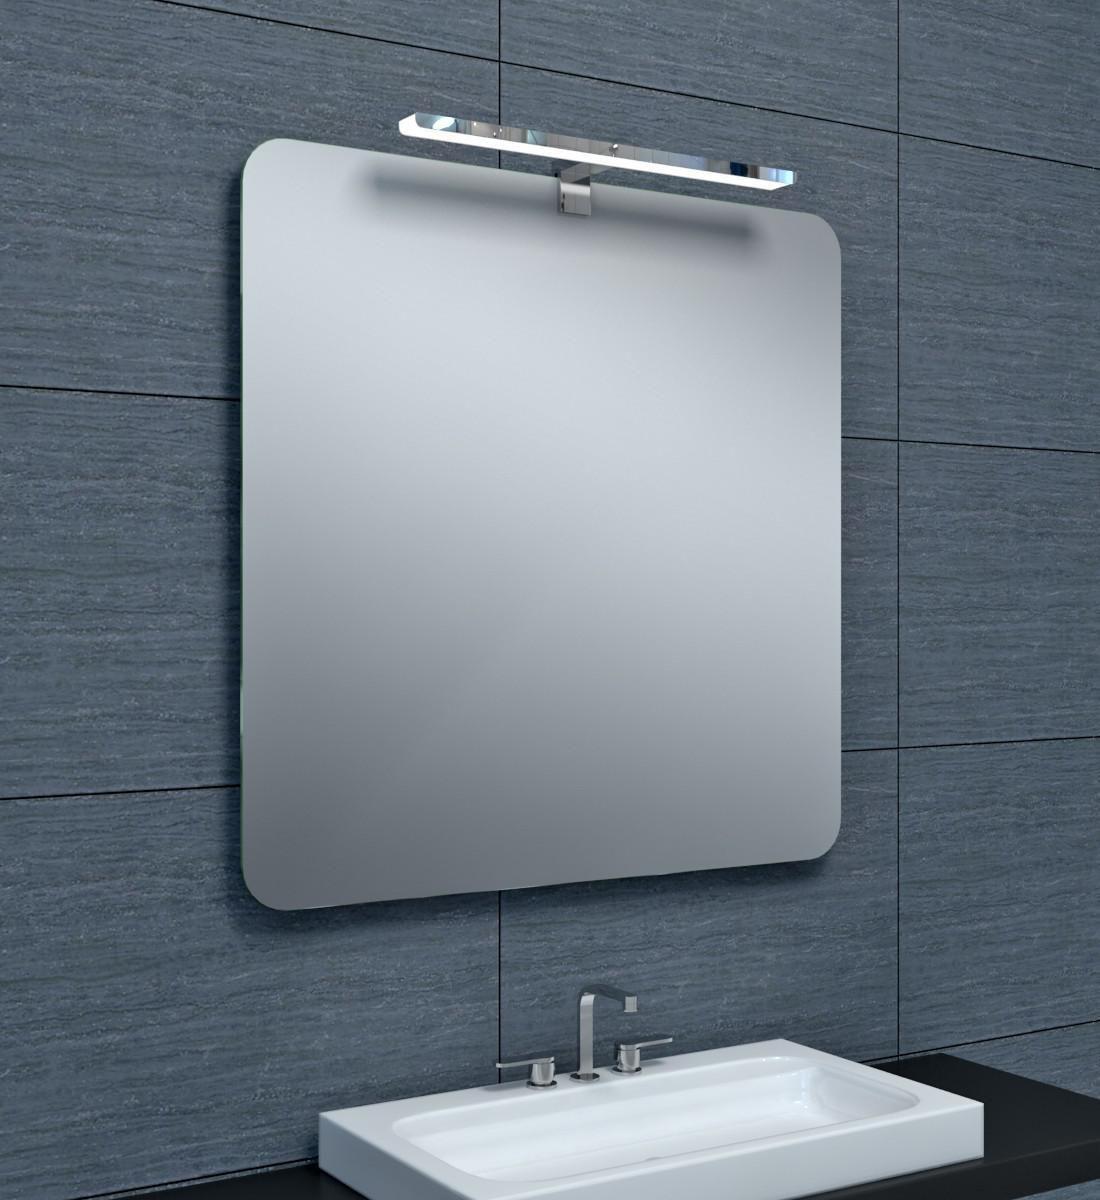 ALTERNA Miroir Milan 80 X Hauteur 80 Cm Cedeo